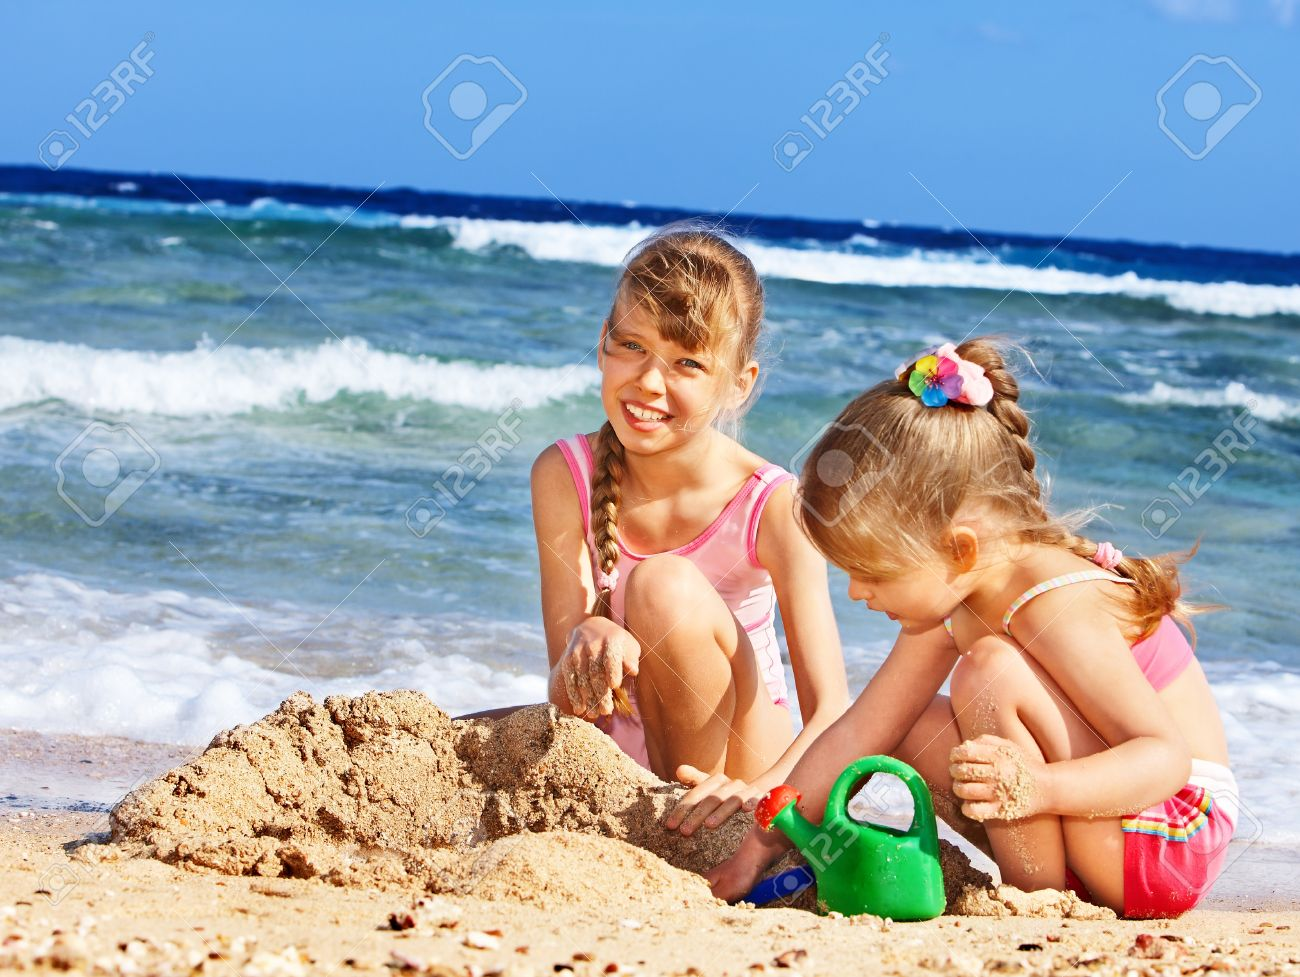 http://previews.123rf.com/images/poznyakov/poznyakov1106/poznyakov110600229/9780810-Little-girl-playing-on-beach--Stock-Photo-sand-children-beach.jpg